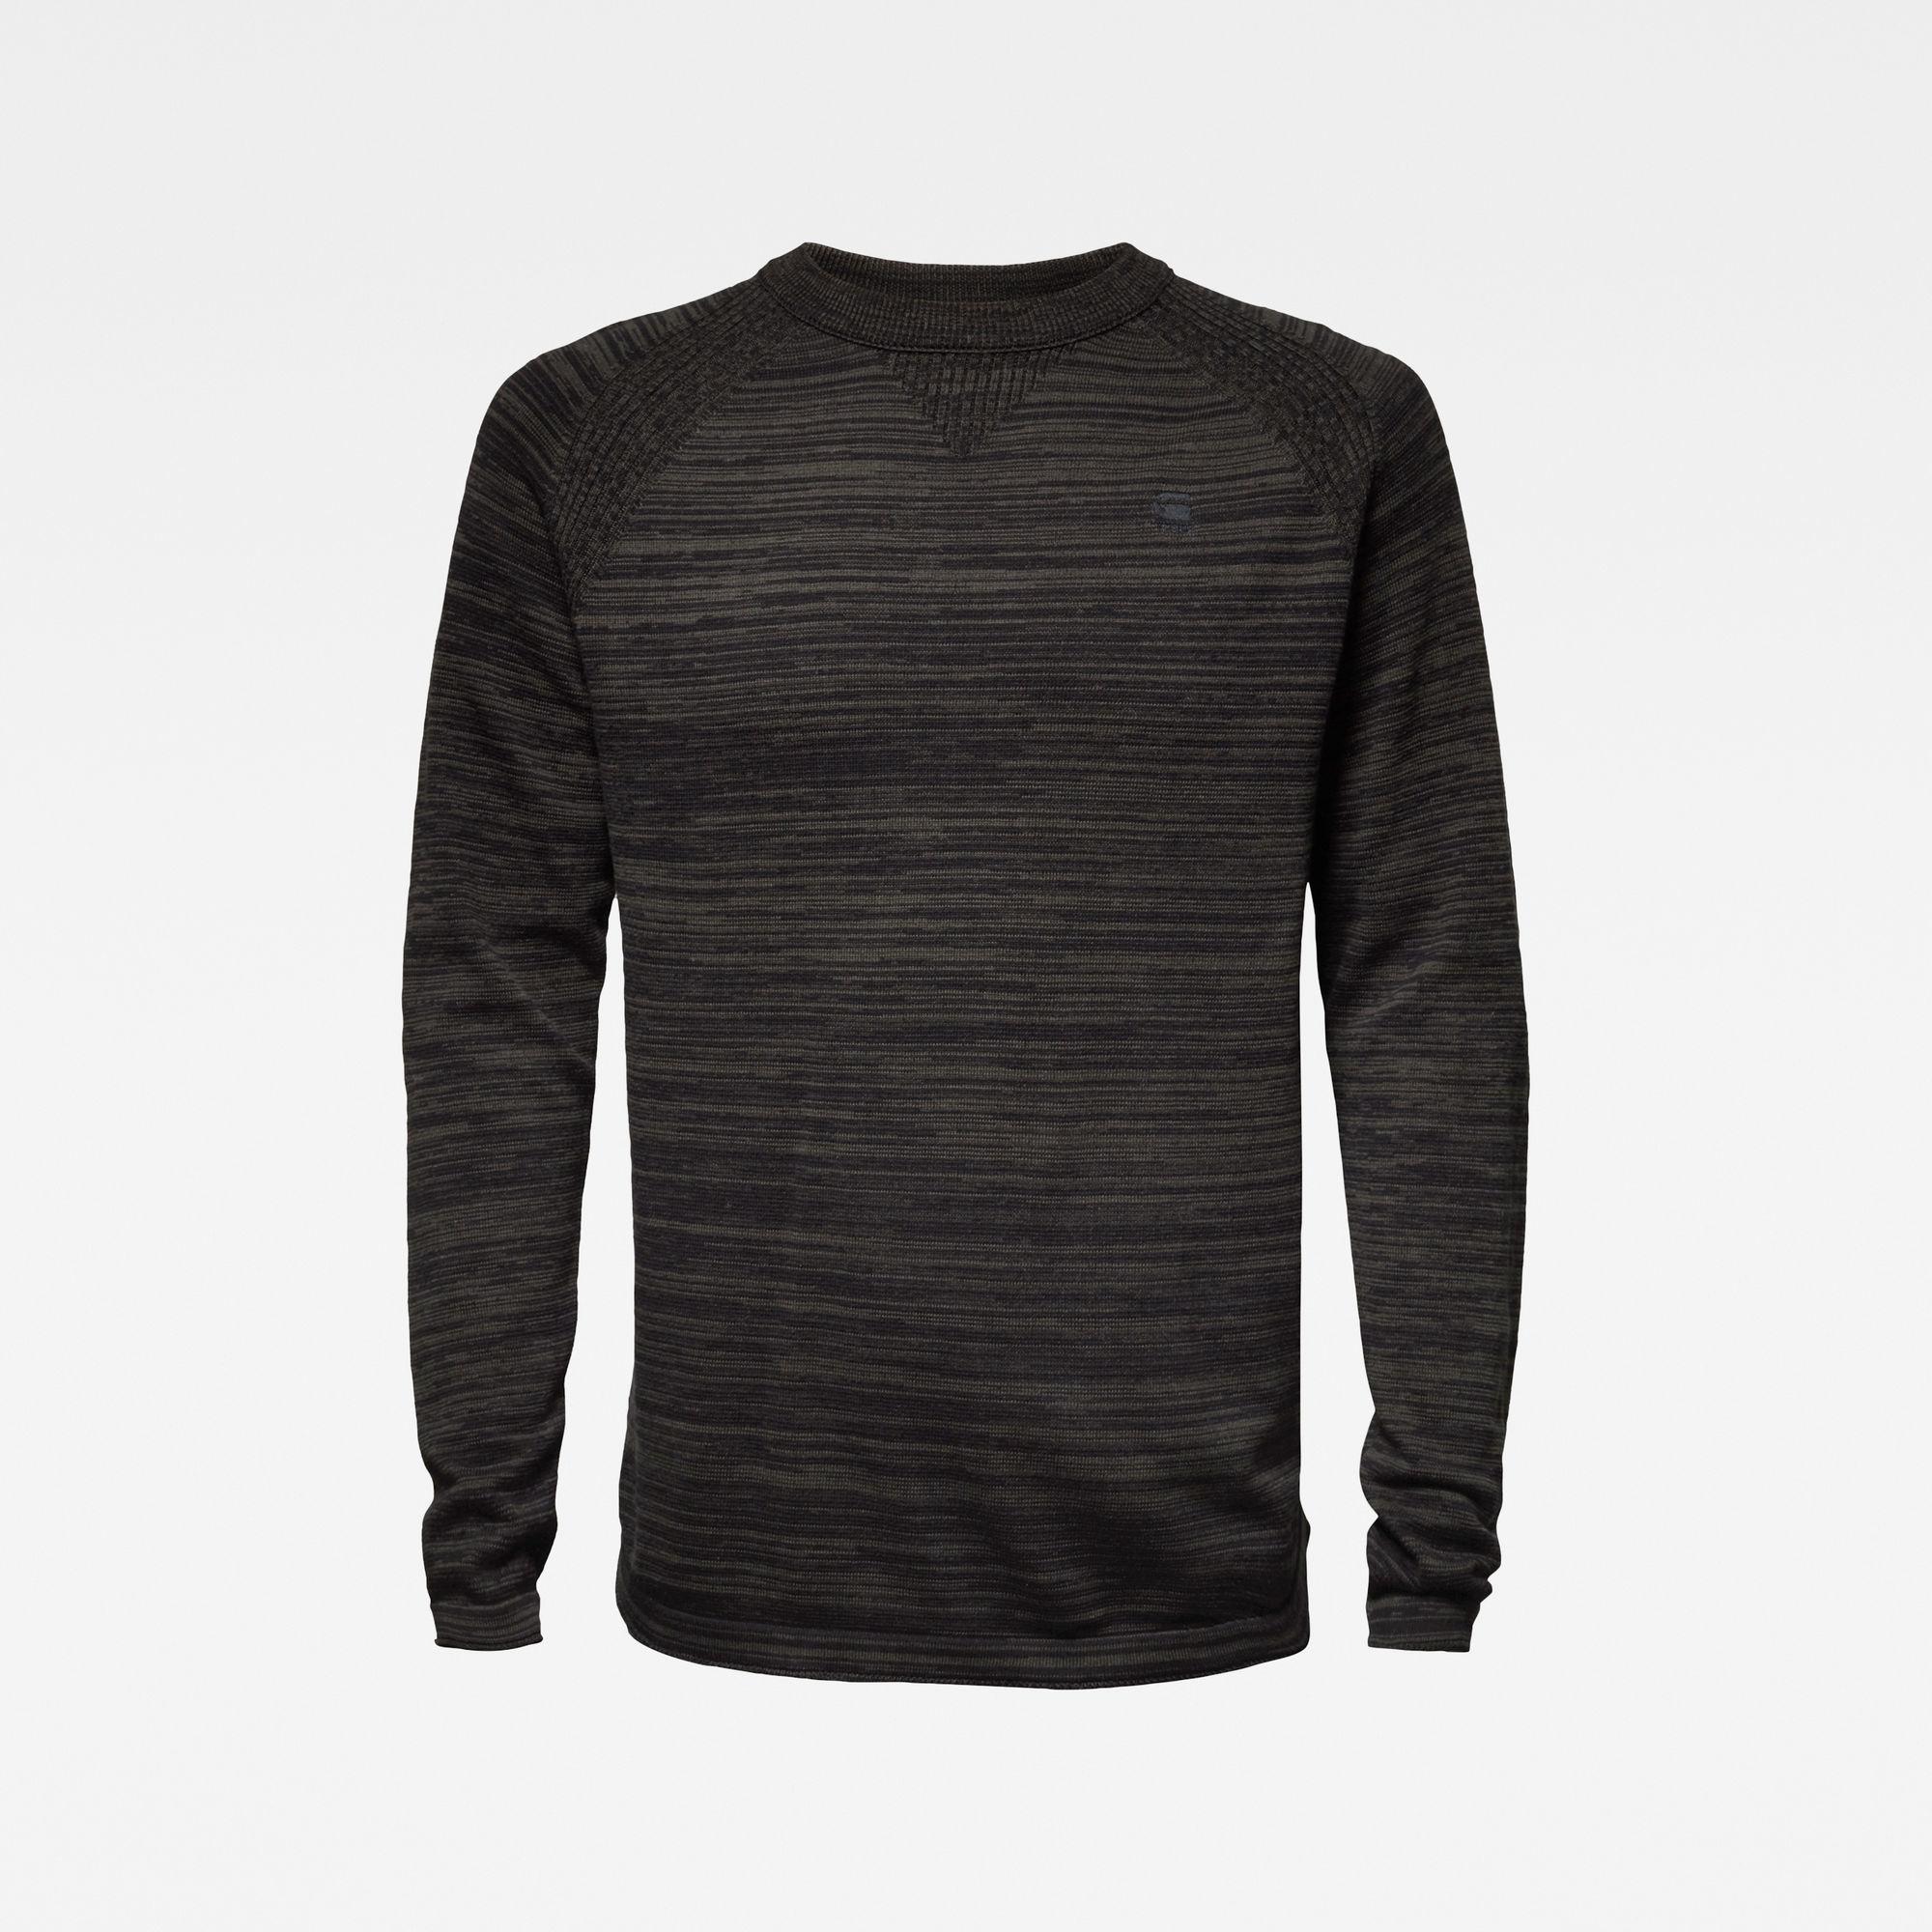 G-Star G-Star Core Solli Straight R Knit Black/Asfalt Grey